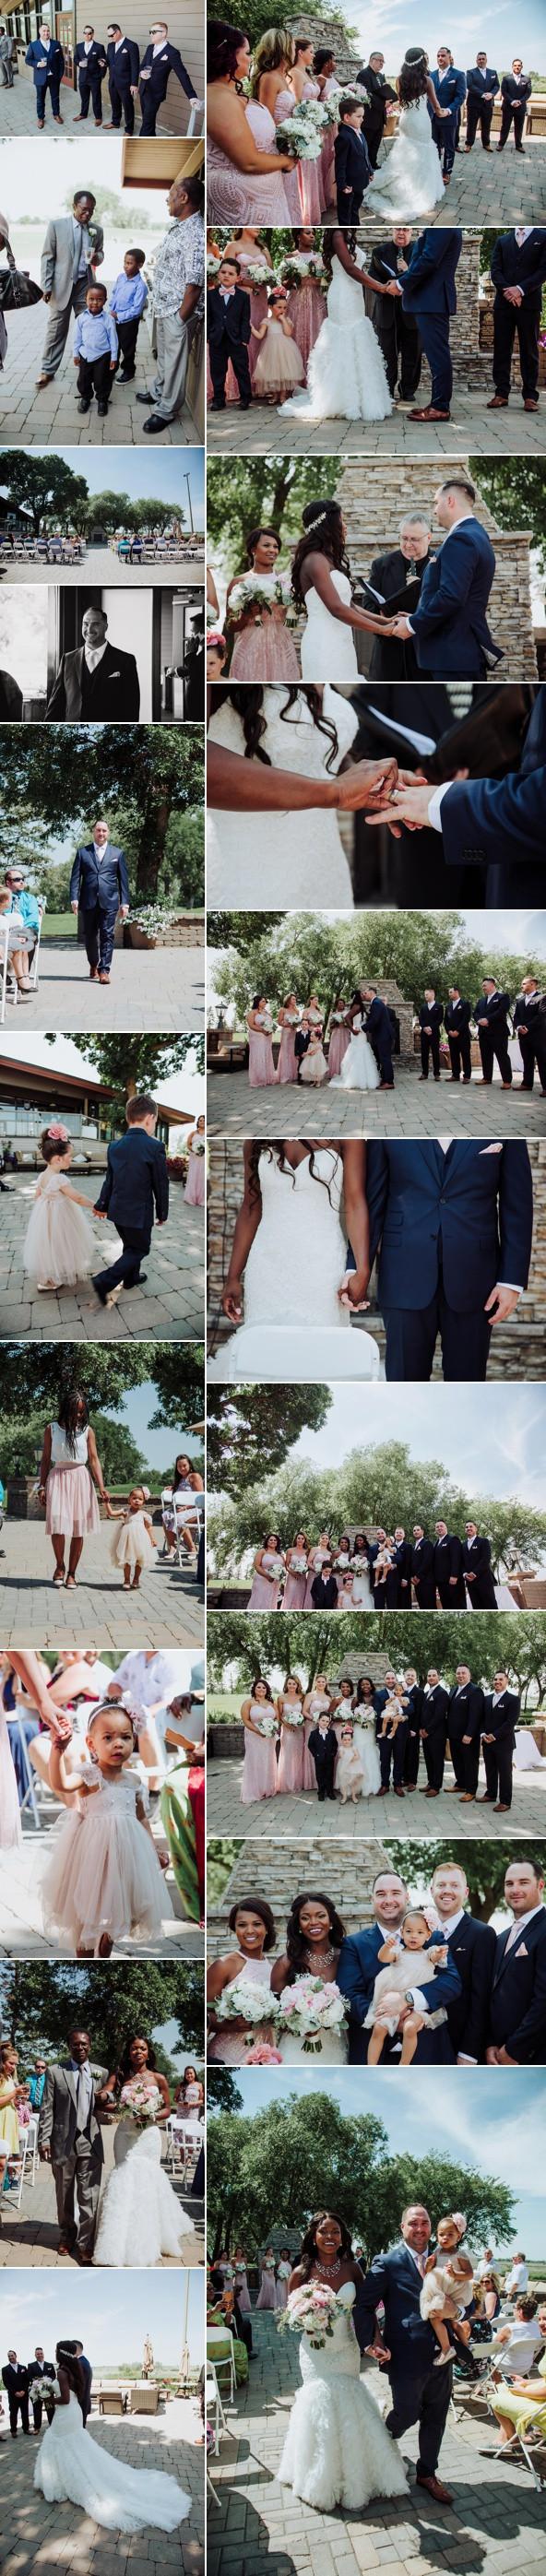 Regina Wedding Ceremony - Wascana Country Club Reception